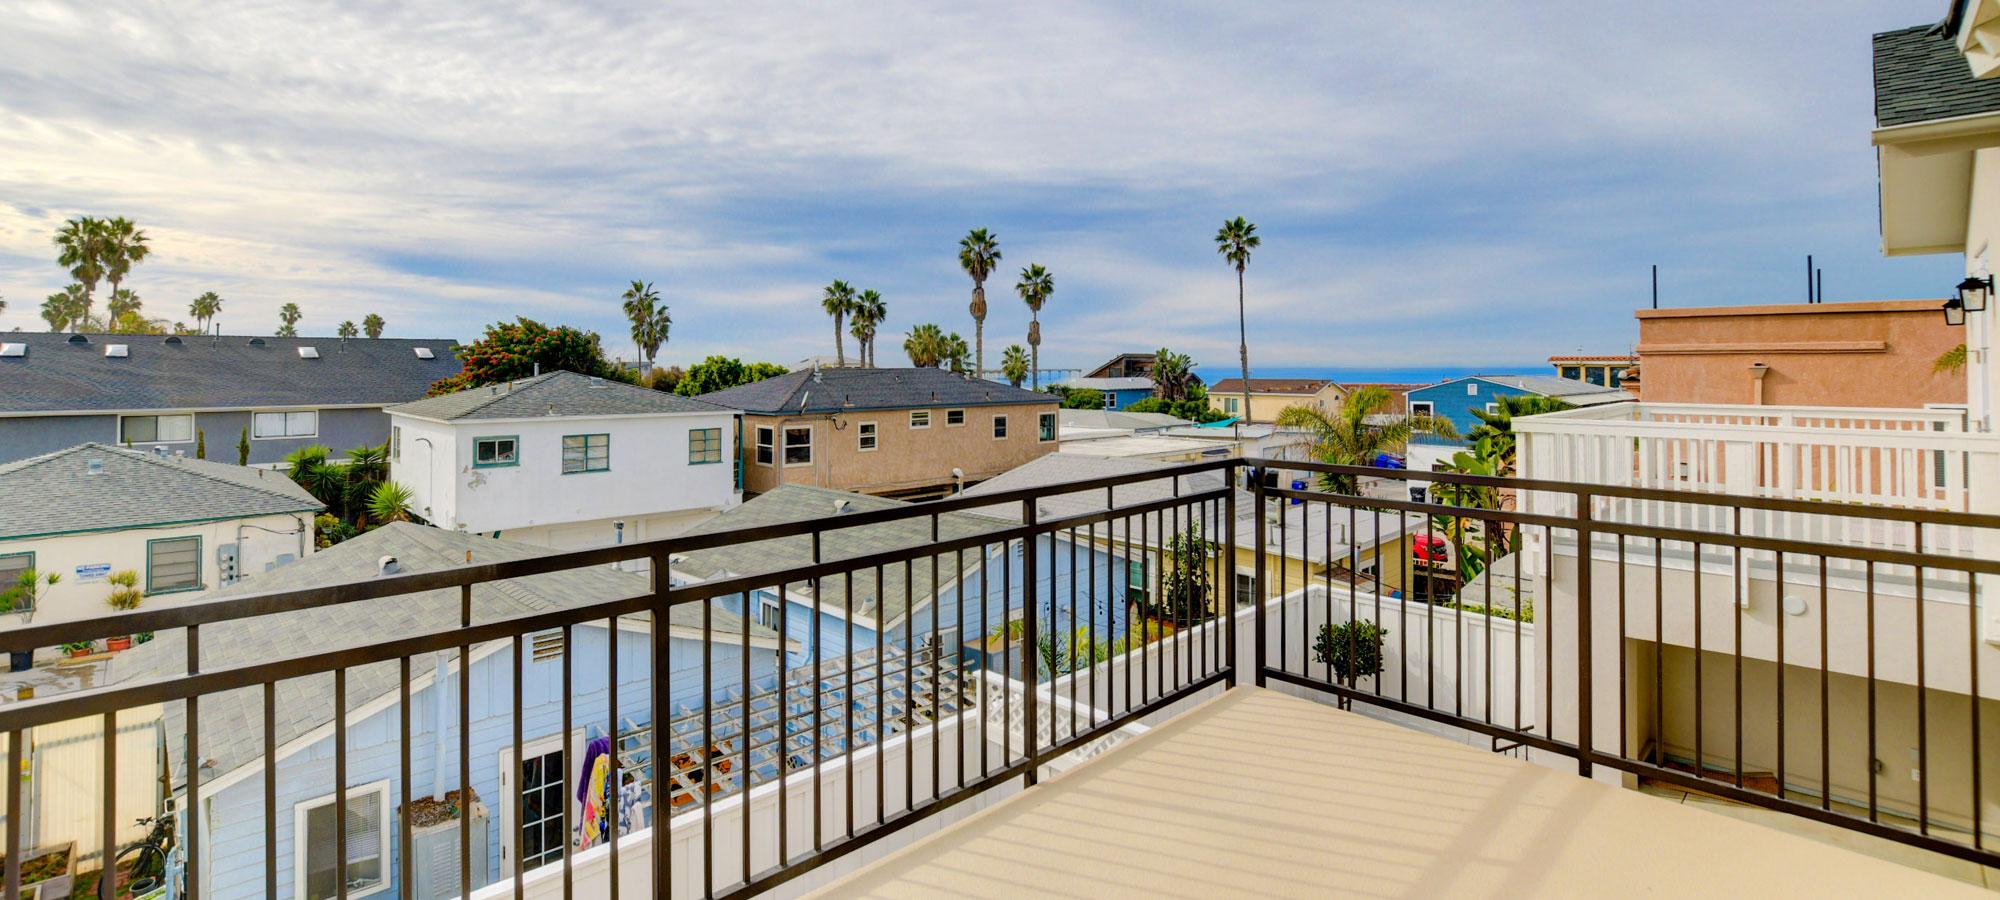 5111 Brighton Ave. San Diego, CA 92107